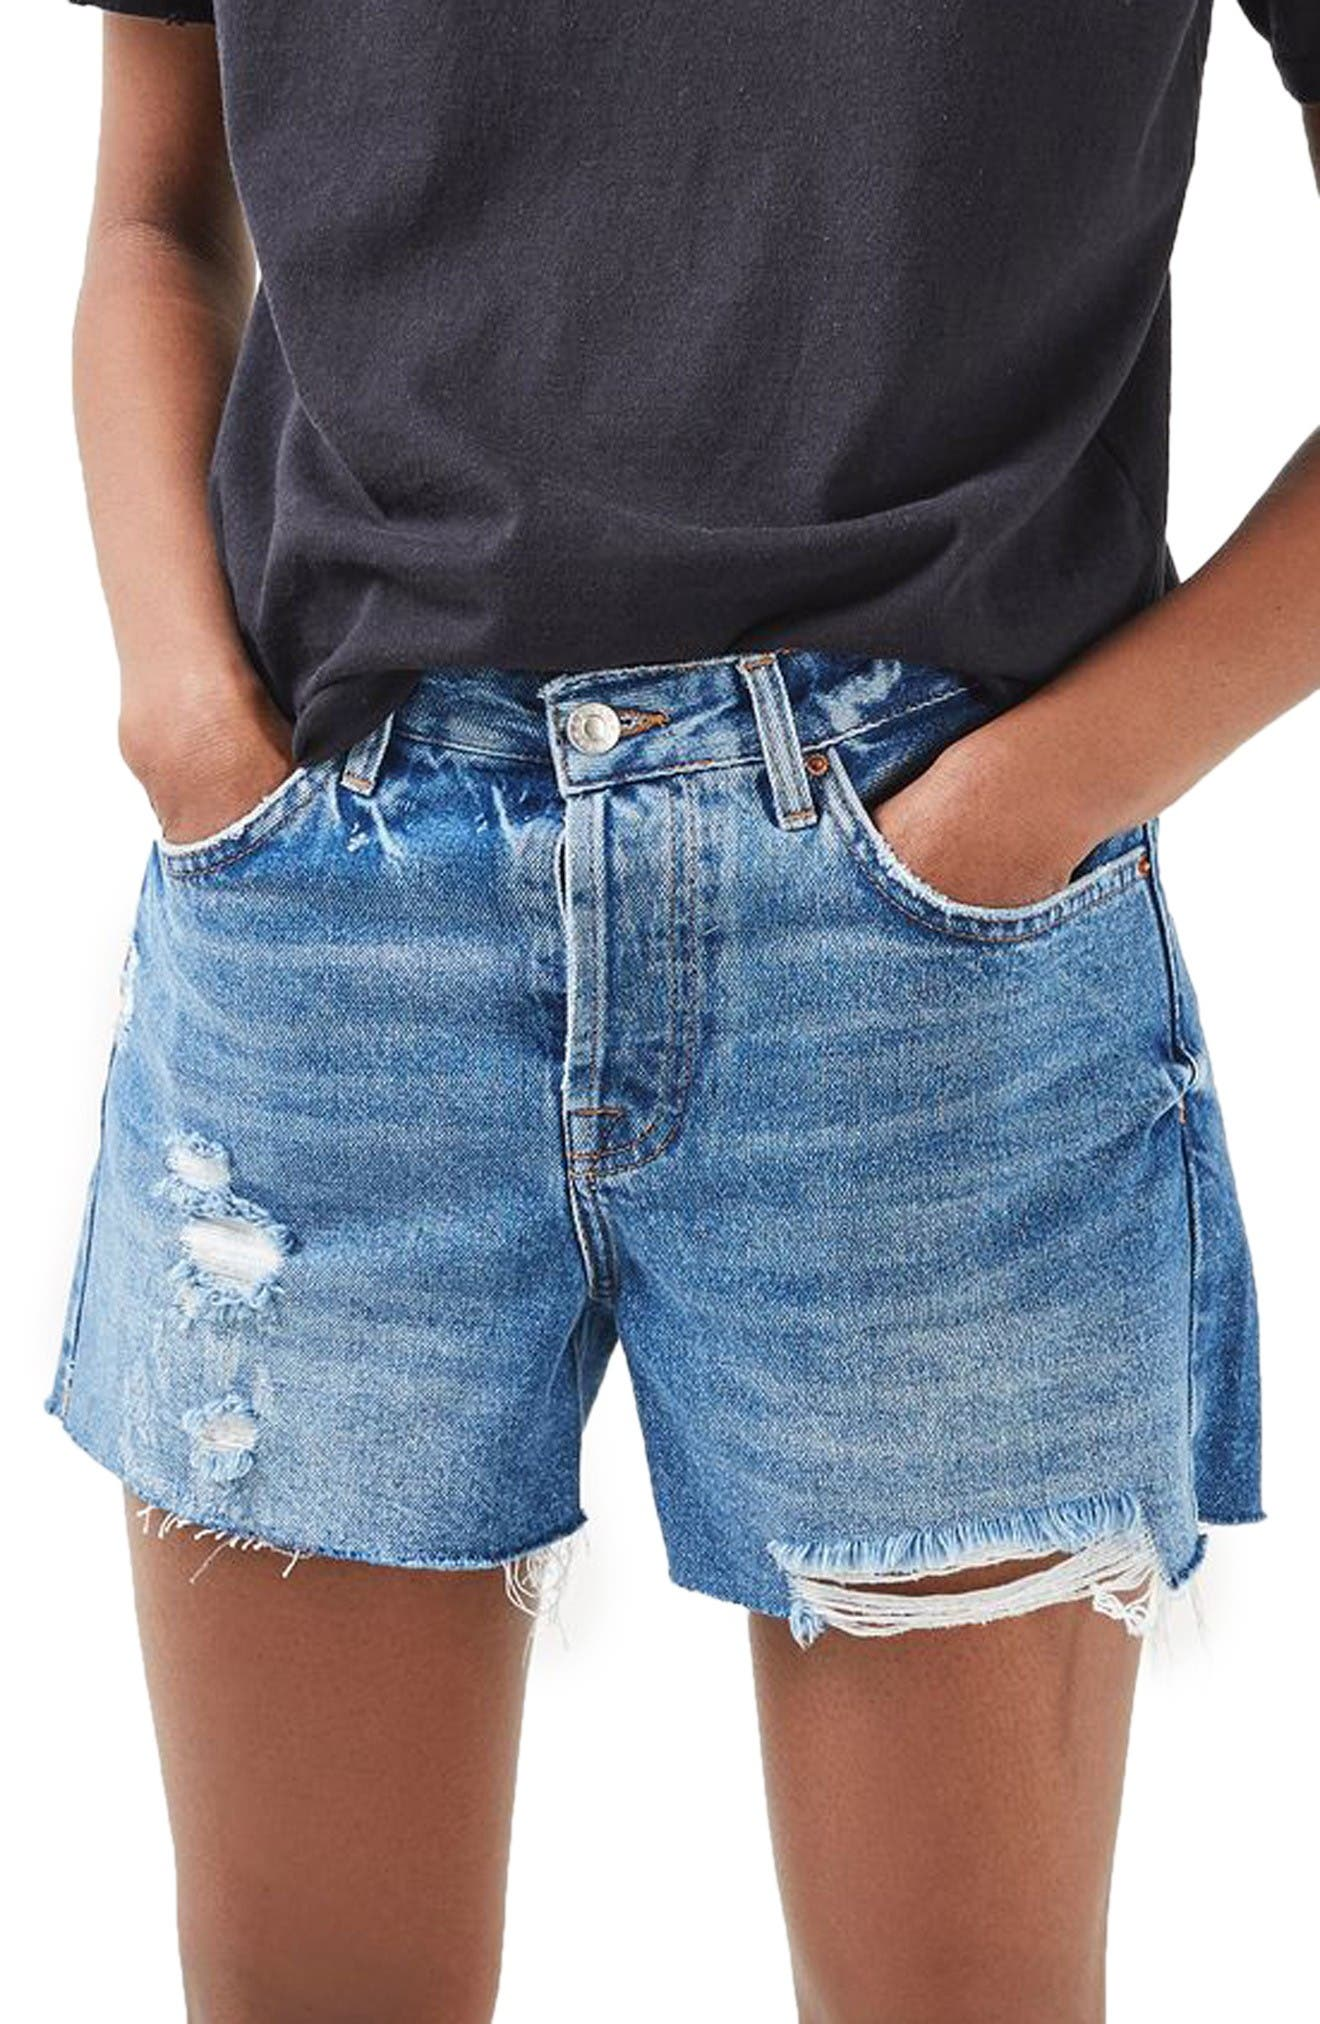 Alternate Image 1 Selected - Topshop Ashley Ripped Boyfriend Shorts (Regular & Petite)